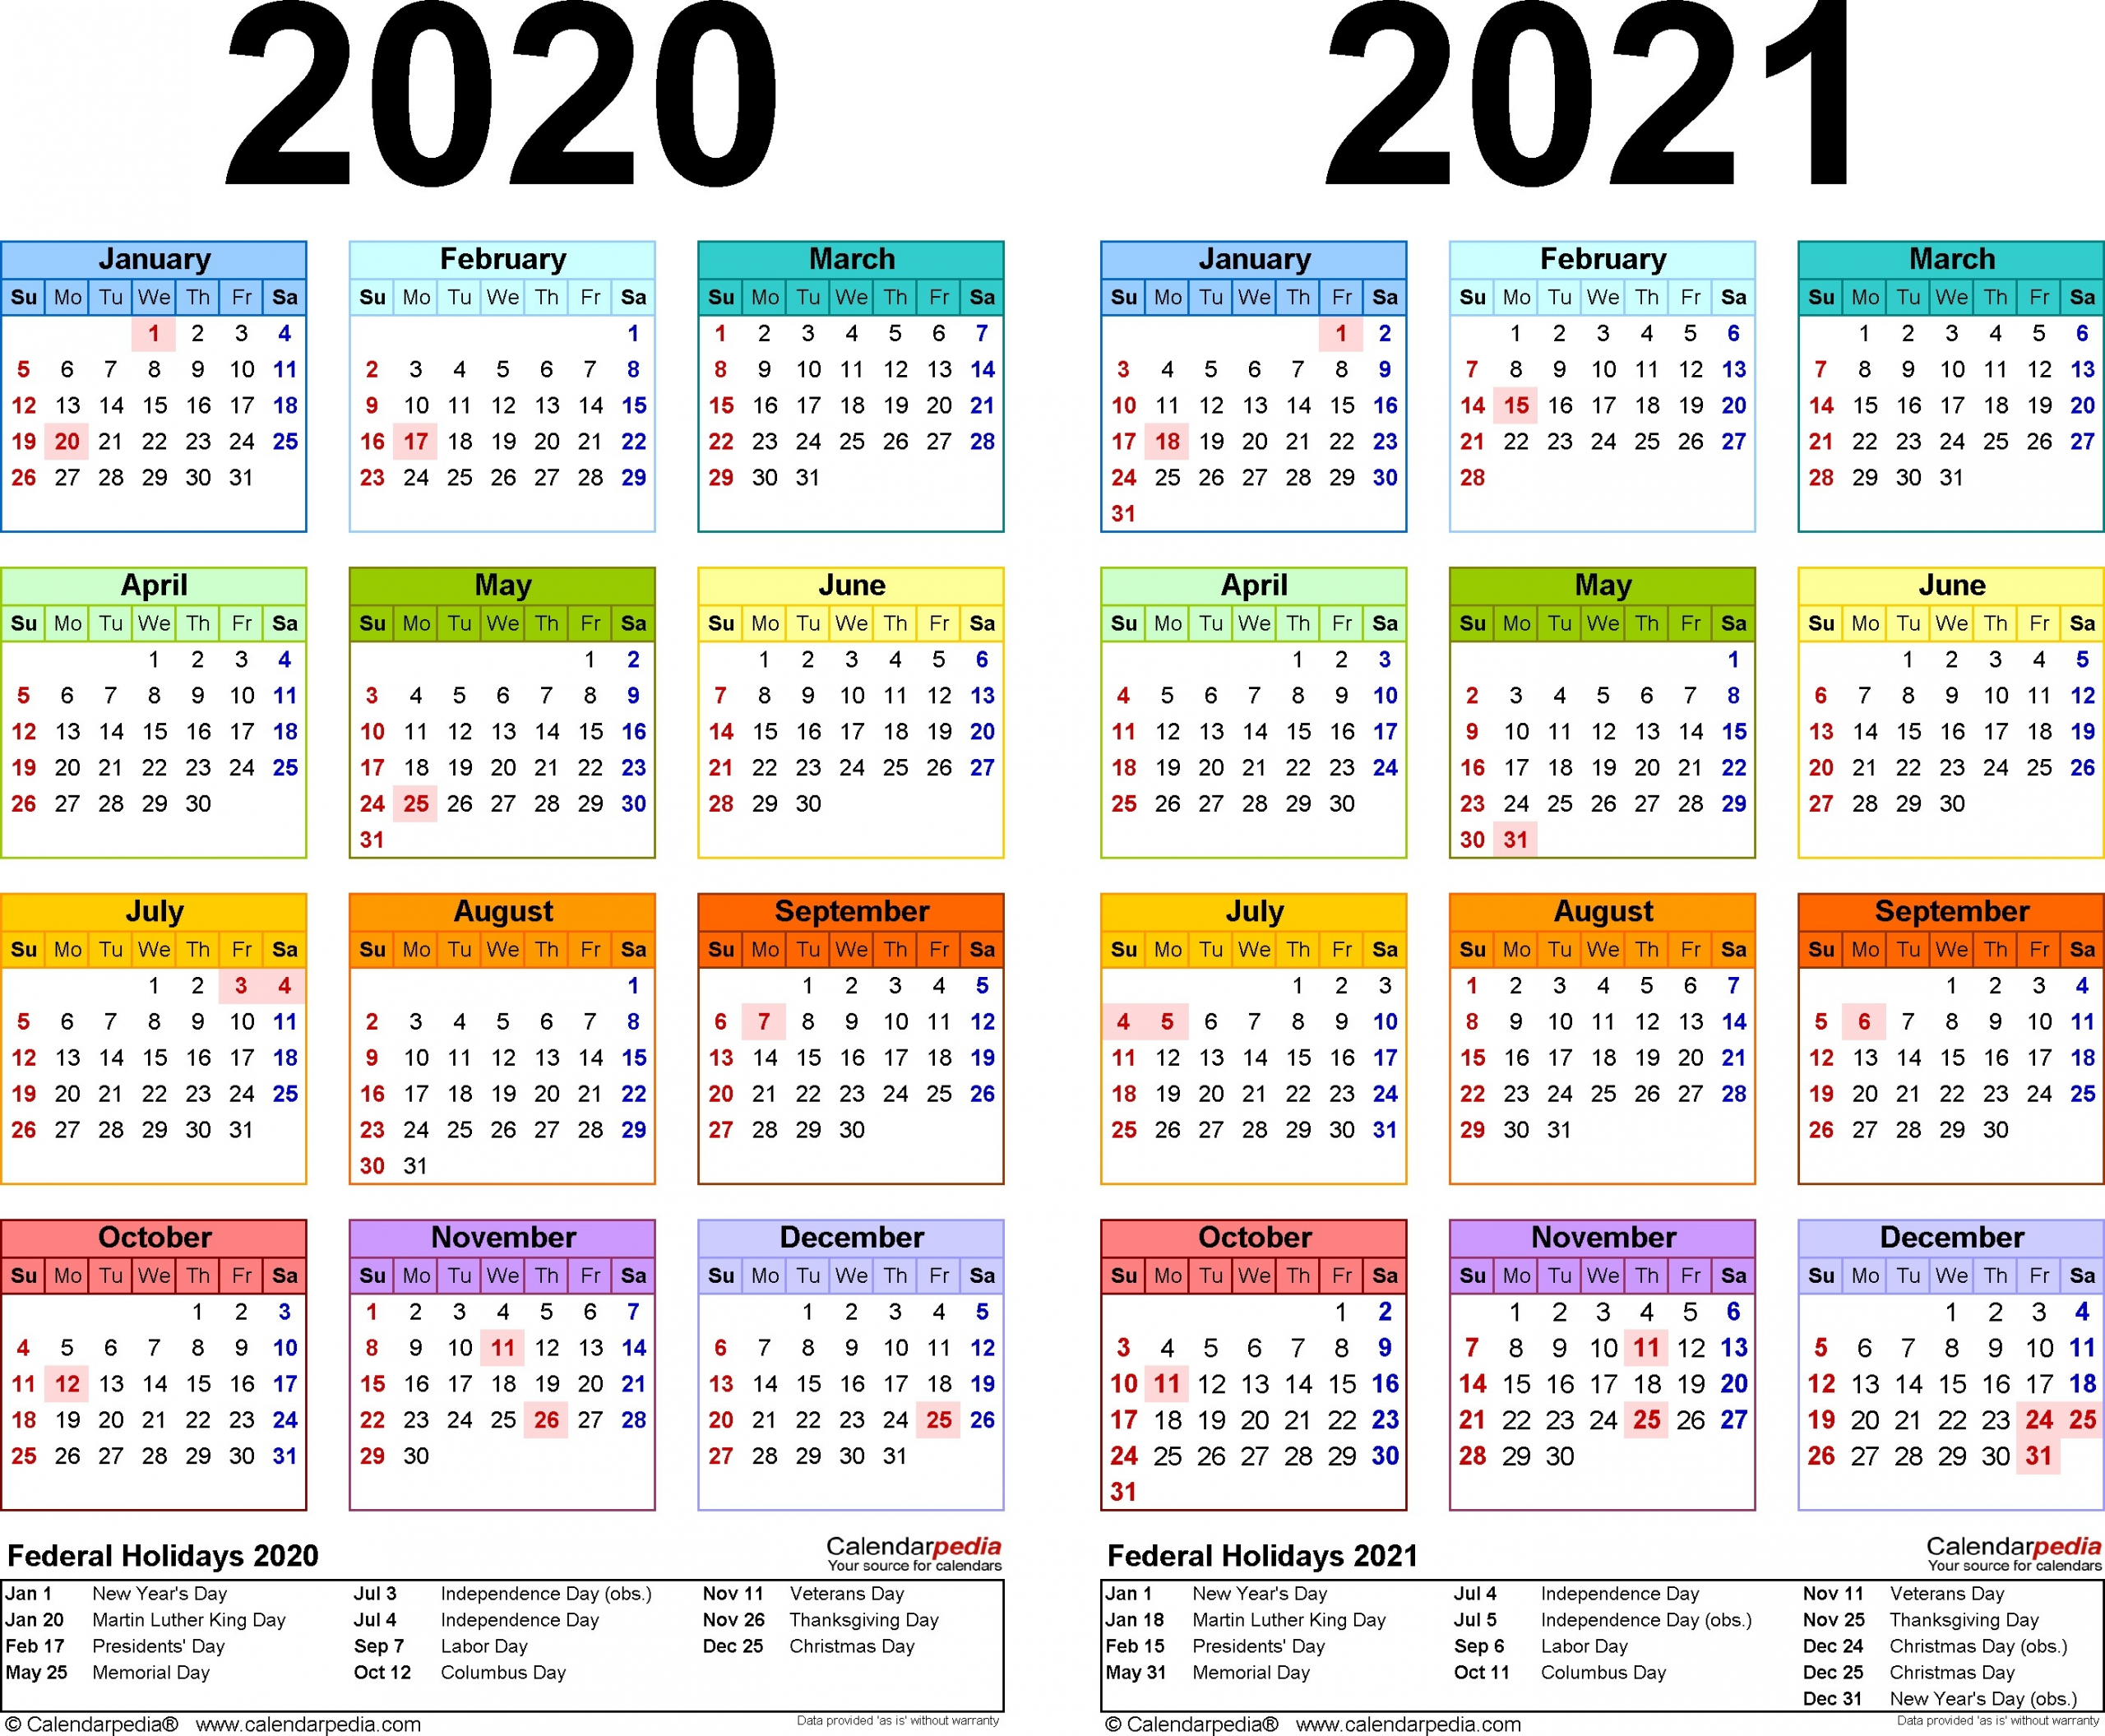 2020 Calendar With Federal Holidays Printable | Free